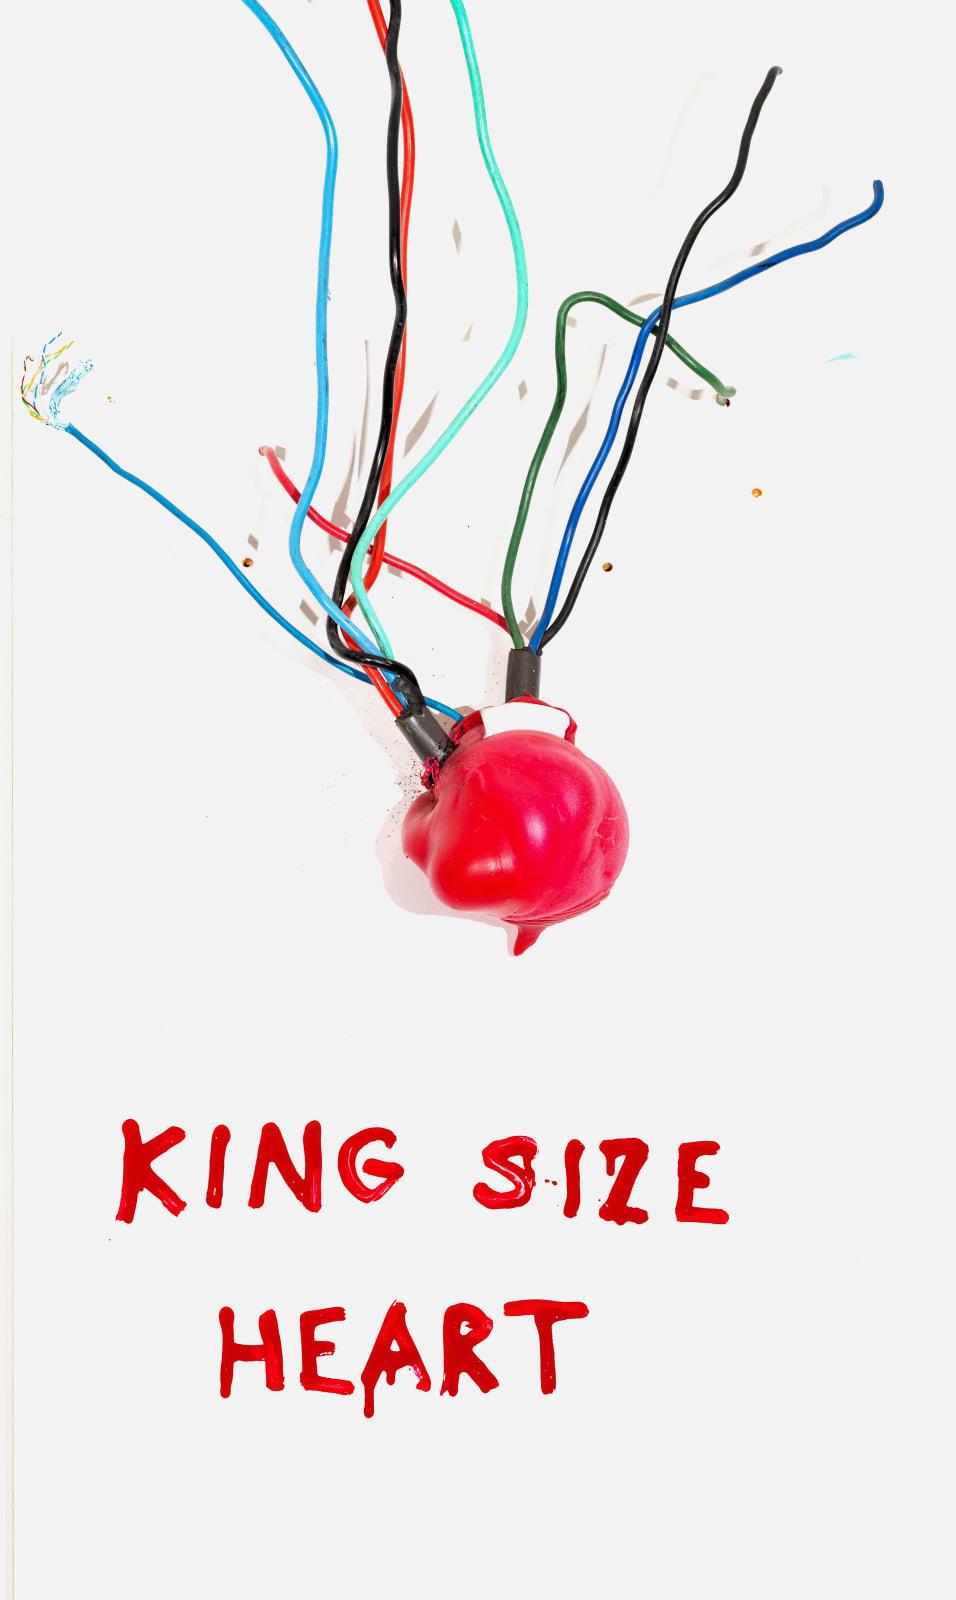 Krištof Kintera, King size heart, 2019